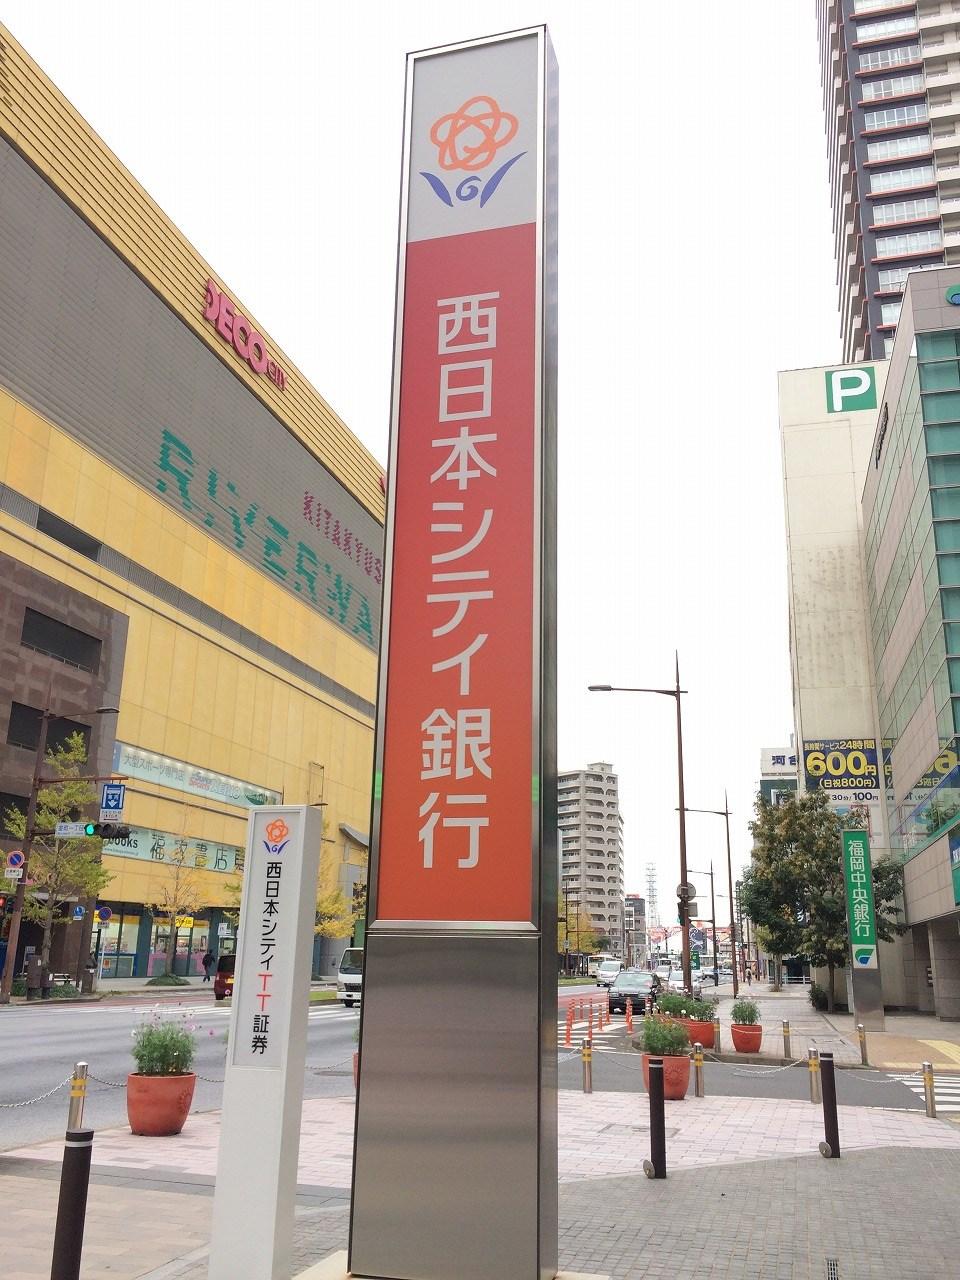 銀行:西日本シティ銀行直方支店 247m